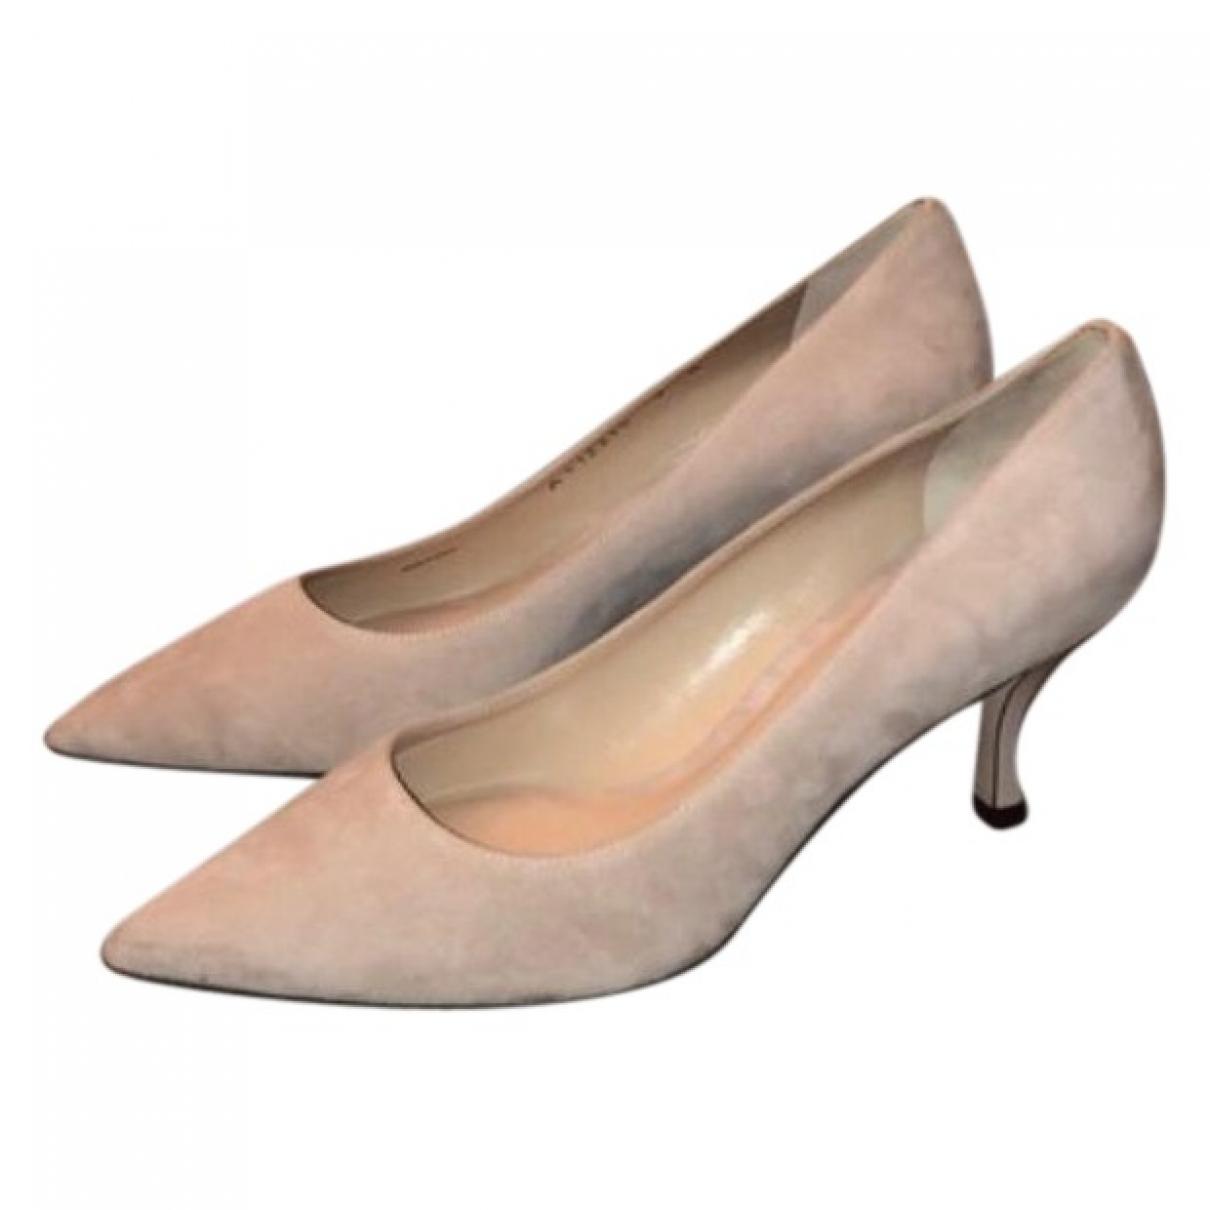 Stuart Weitzman \N Beige Leather Heels for Women 9 US